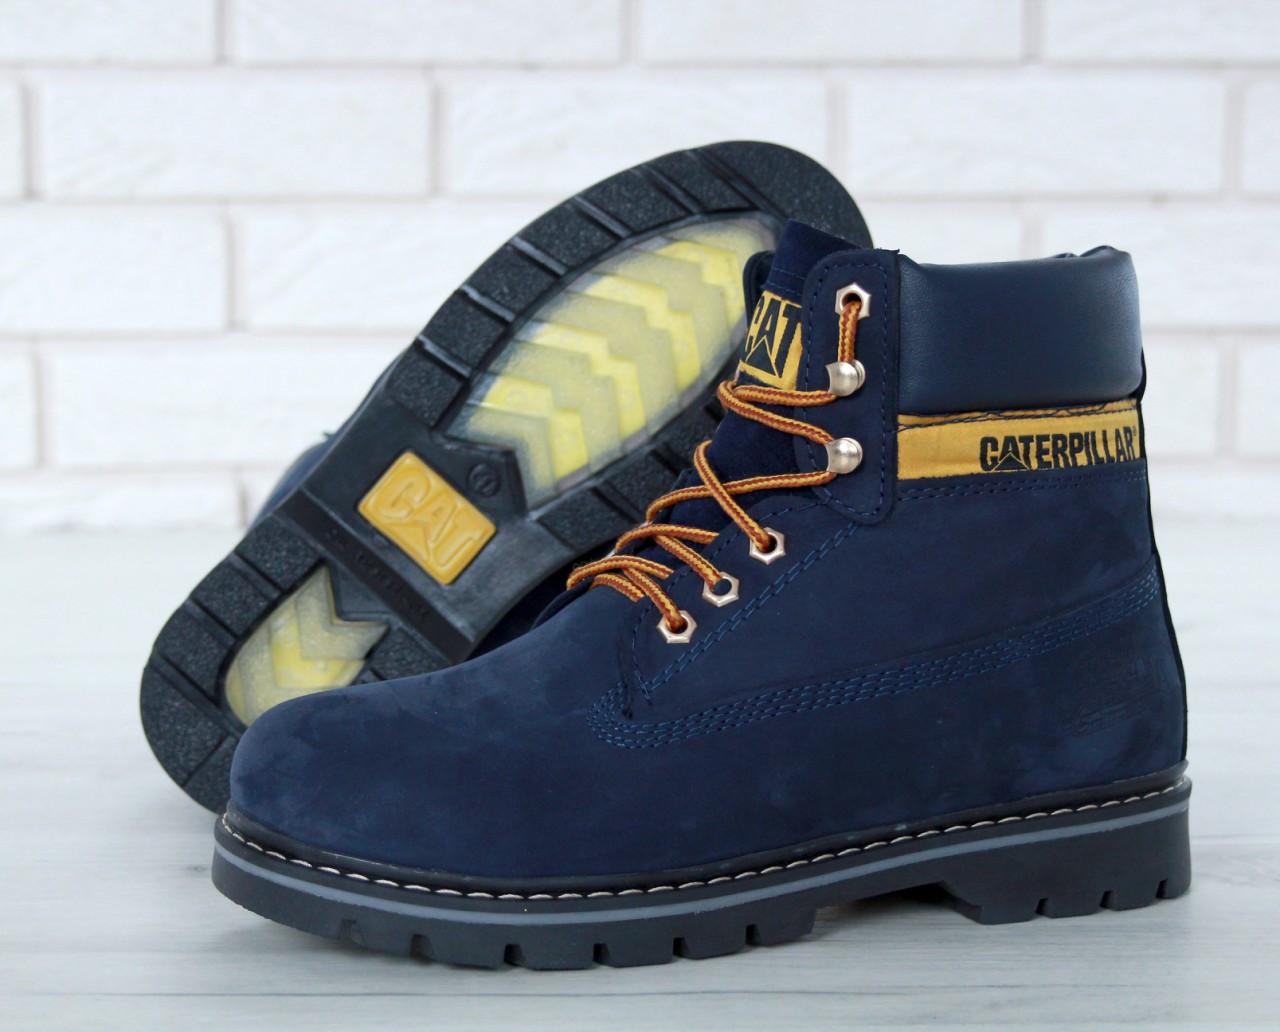 Мужские зимние ботинки Caterpillar Colorado Fur, мужские ботинки. ТОП Реплика ААА класса.